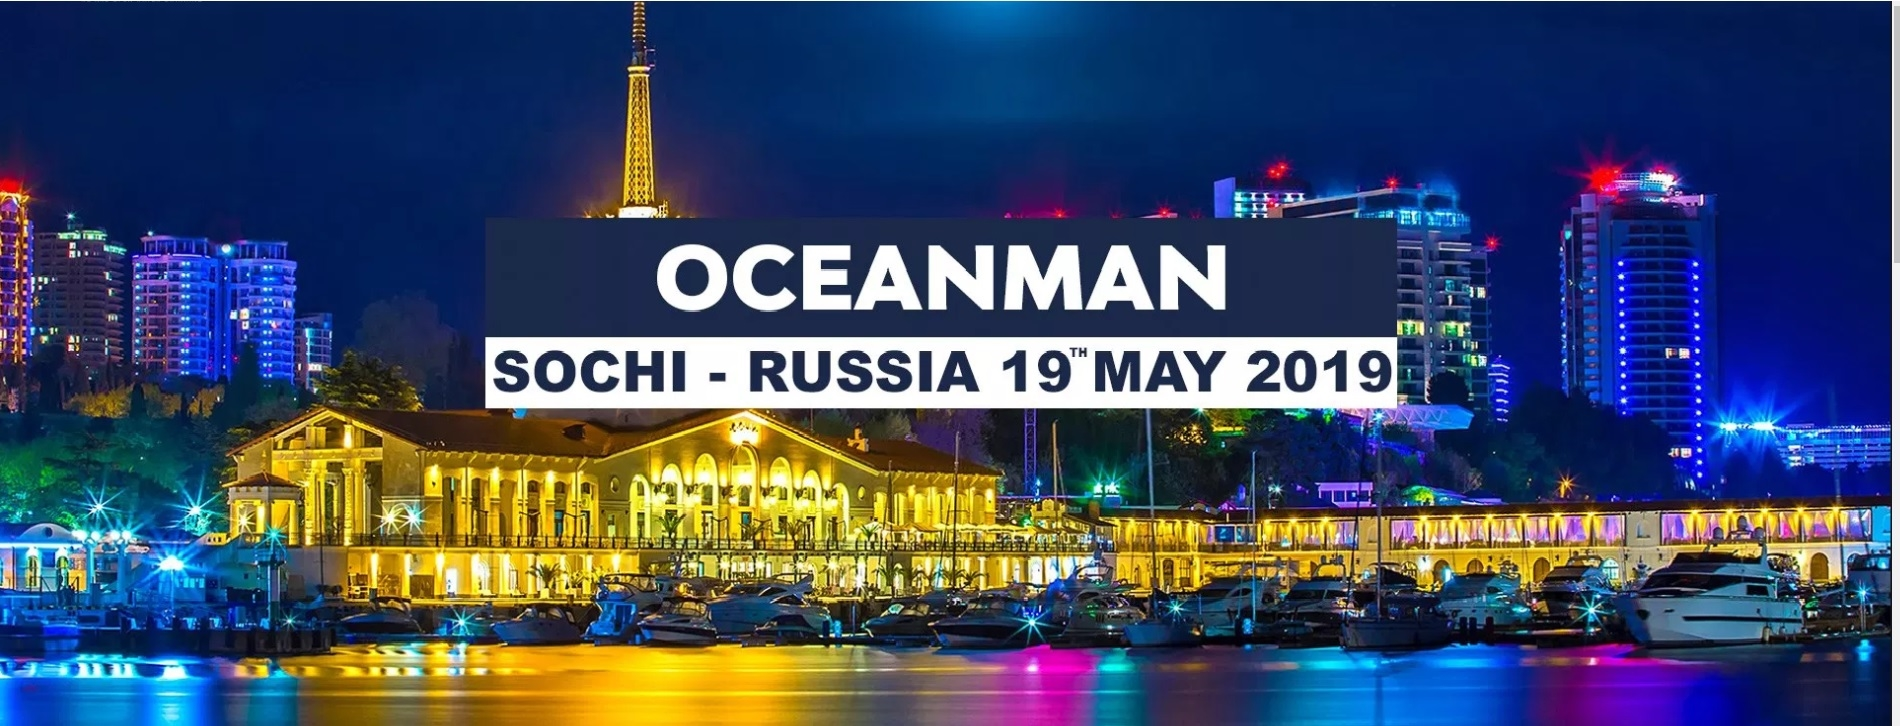 OCEANMAN SOCHI - RUSSIA 2019